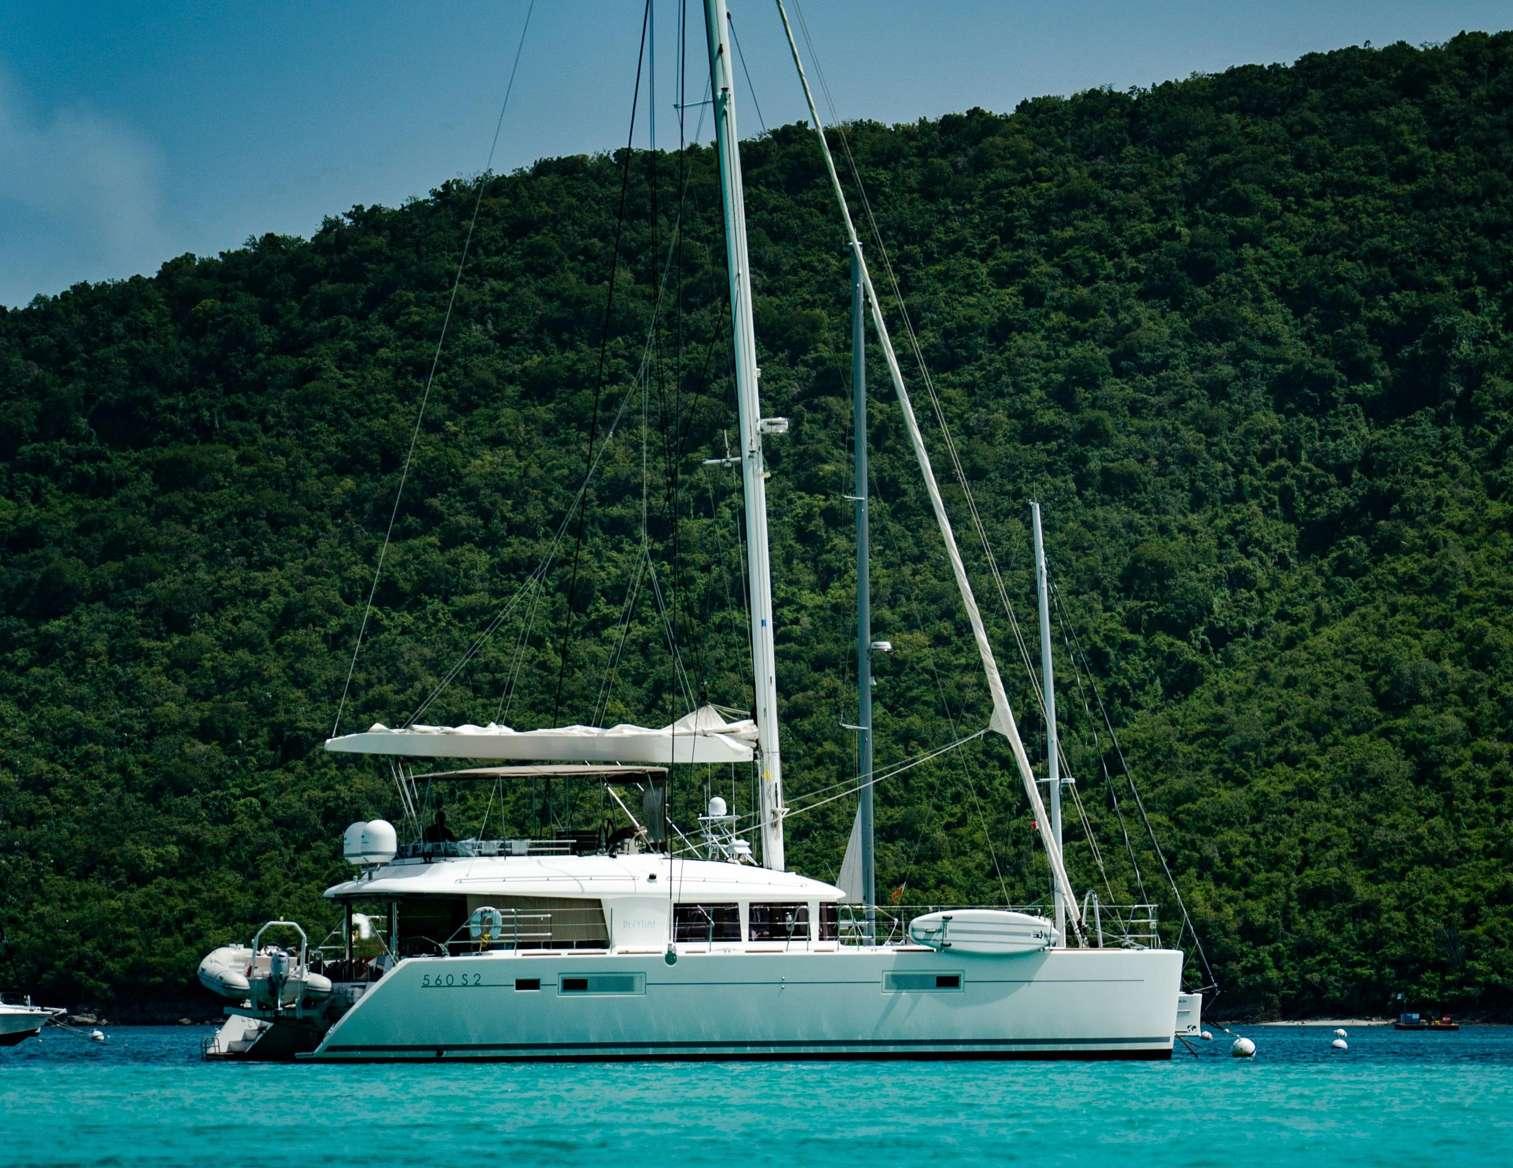 Cat Yacht 'Cat', 8 PAX, 2 Crew, 56.00 Ft, 17.00 Meters, Built 2014, Lagoon, Refit Year